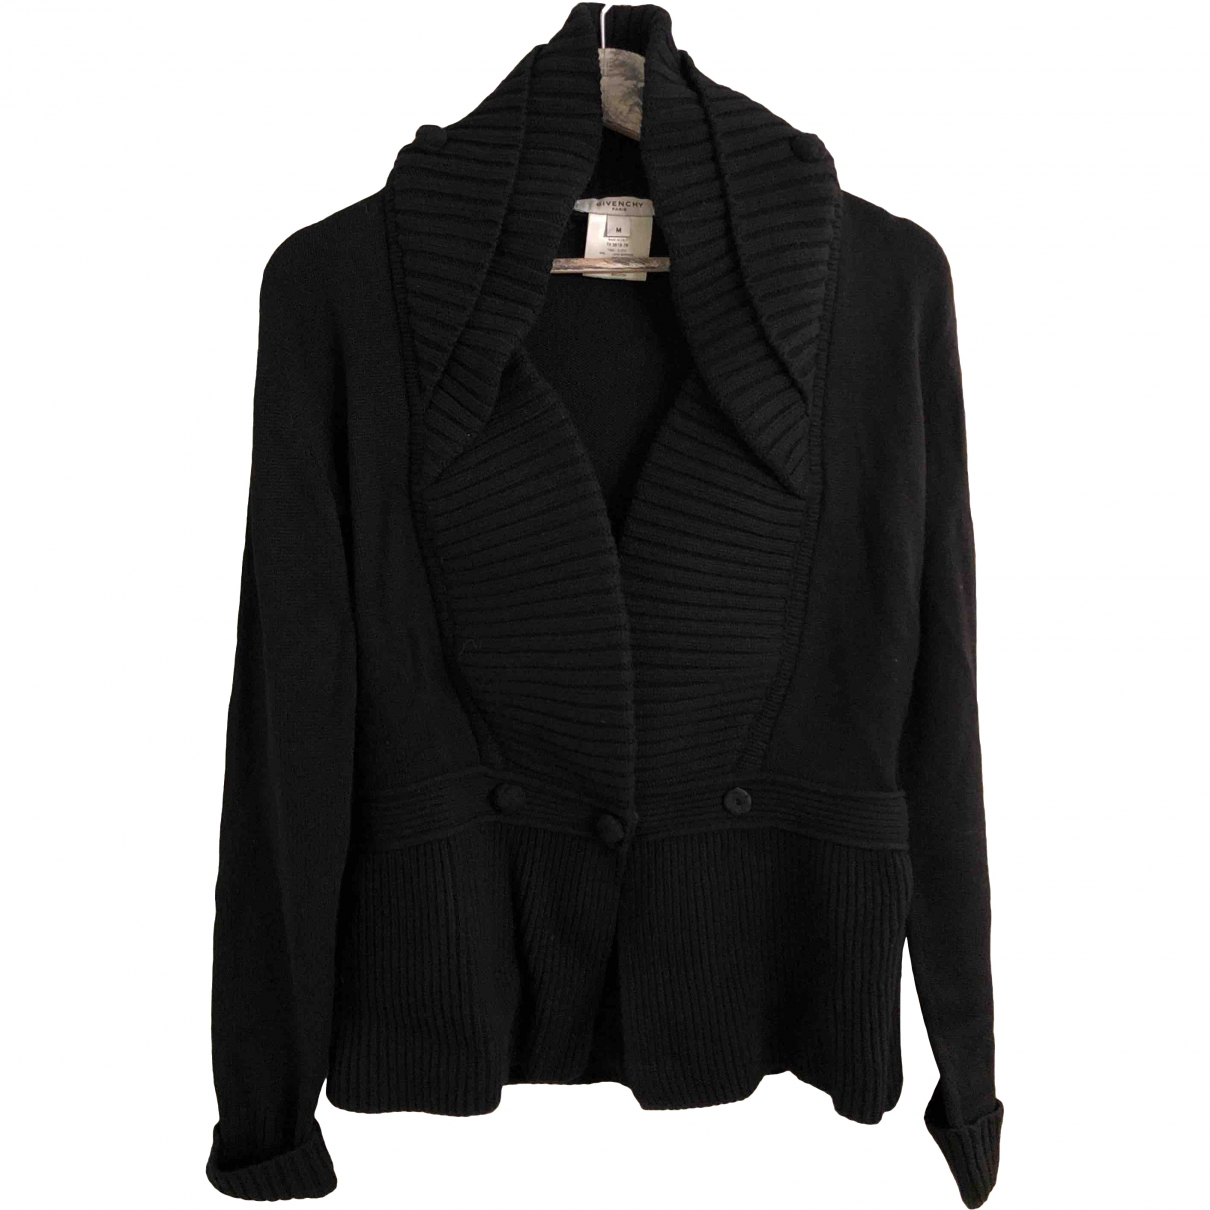 Givenchy \N Black Wool Knitwear for Women M International